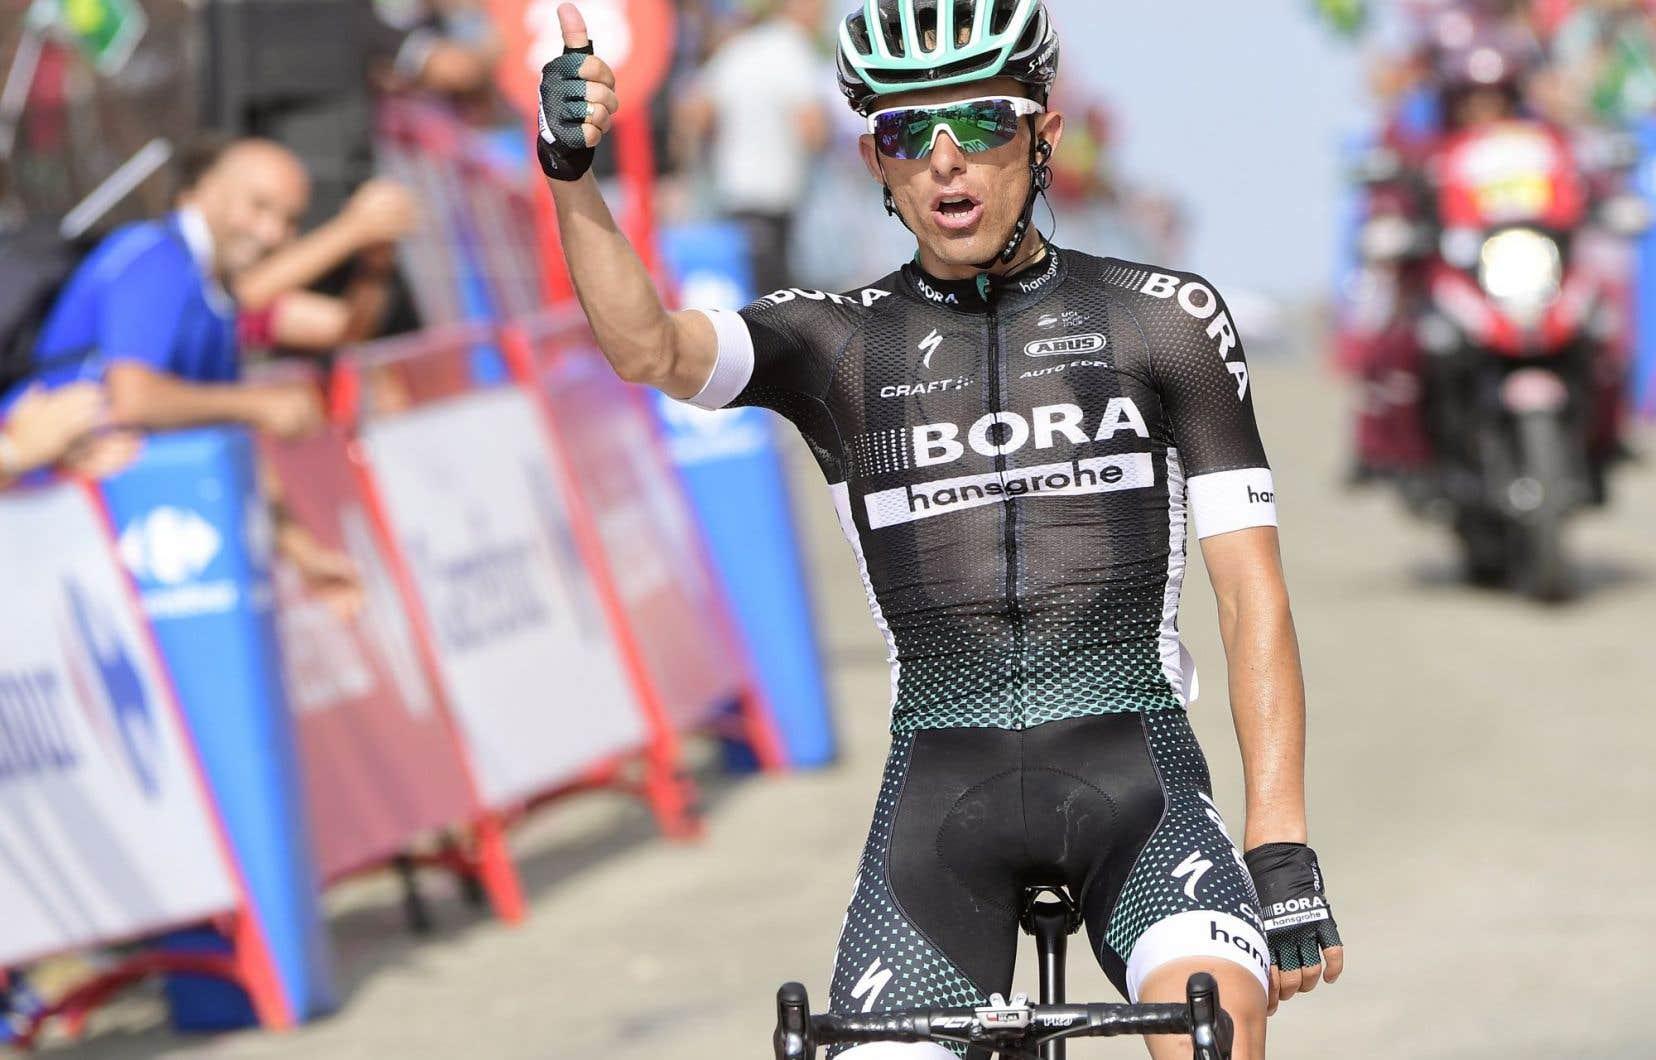 Le cycliste polonais Rafal Majka